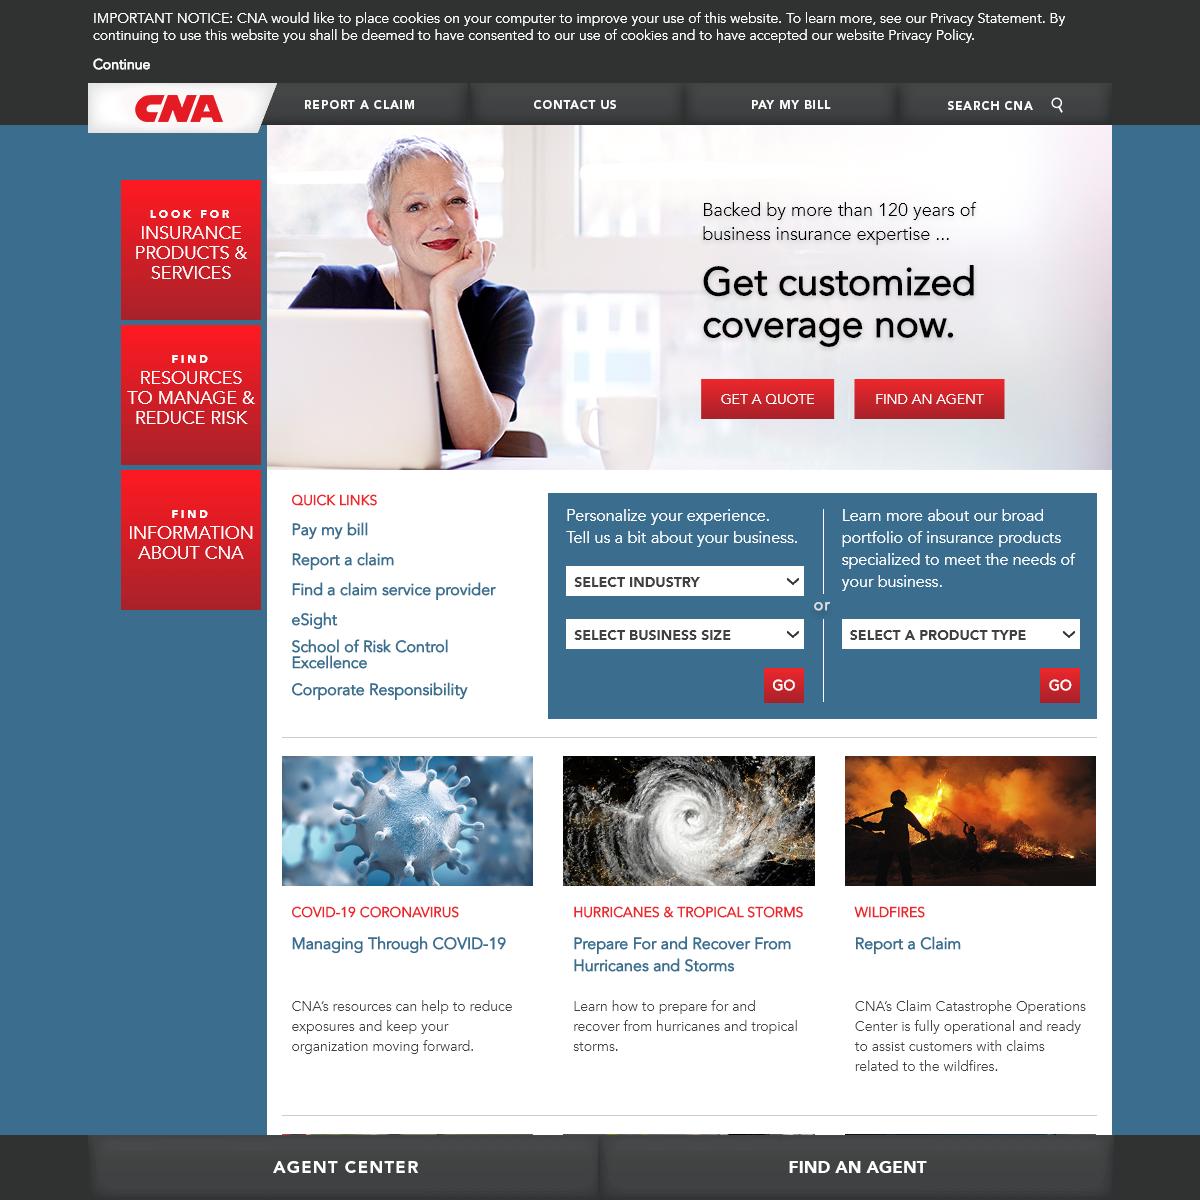 Customized Business Insurance - CNA Insurance